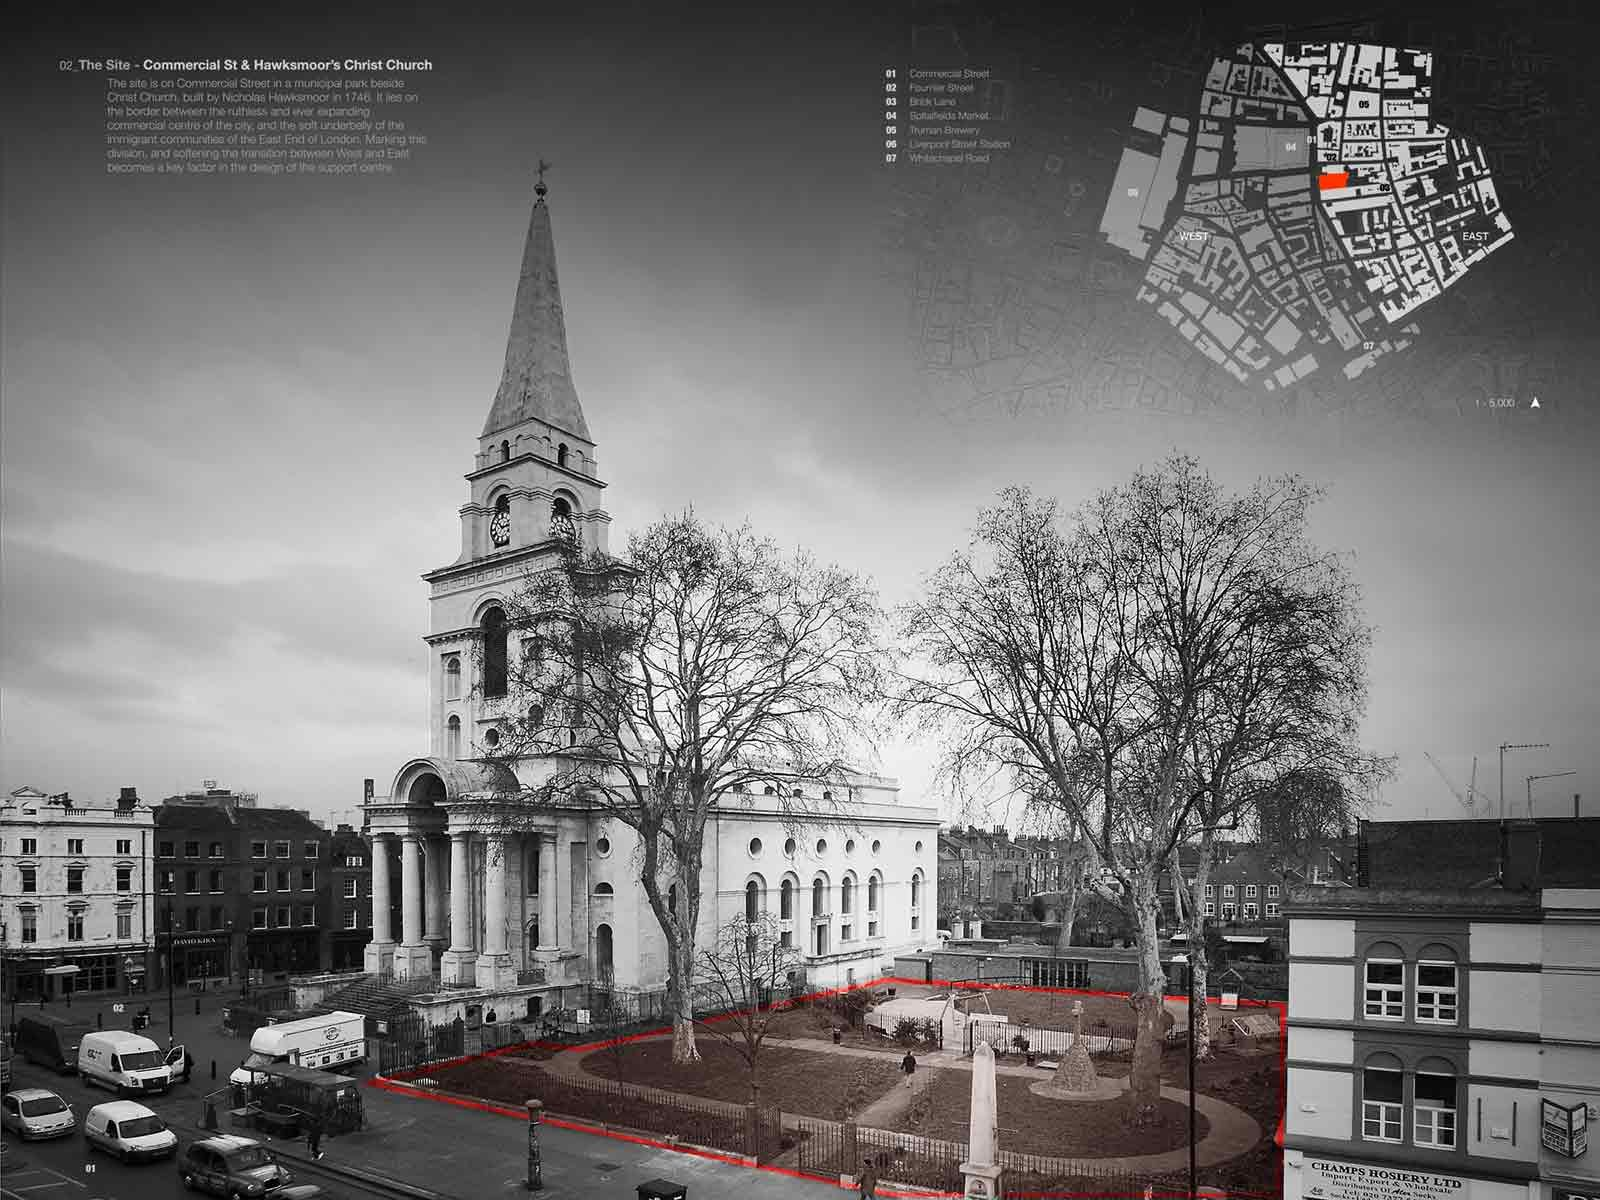 Christ Church, Spitalfields. London. Nicholas Hawksmoor, architect.